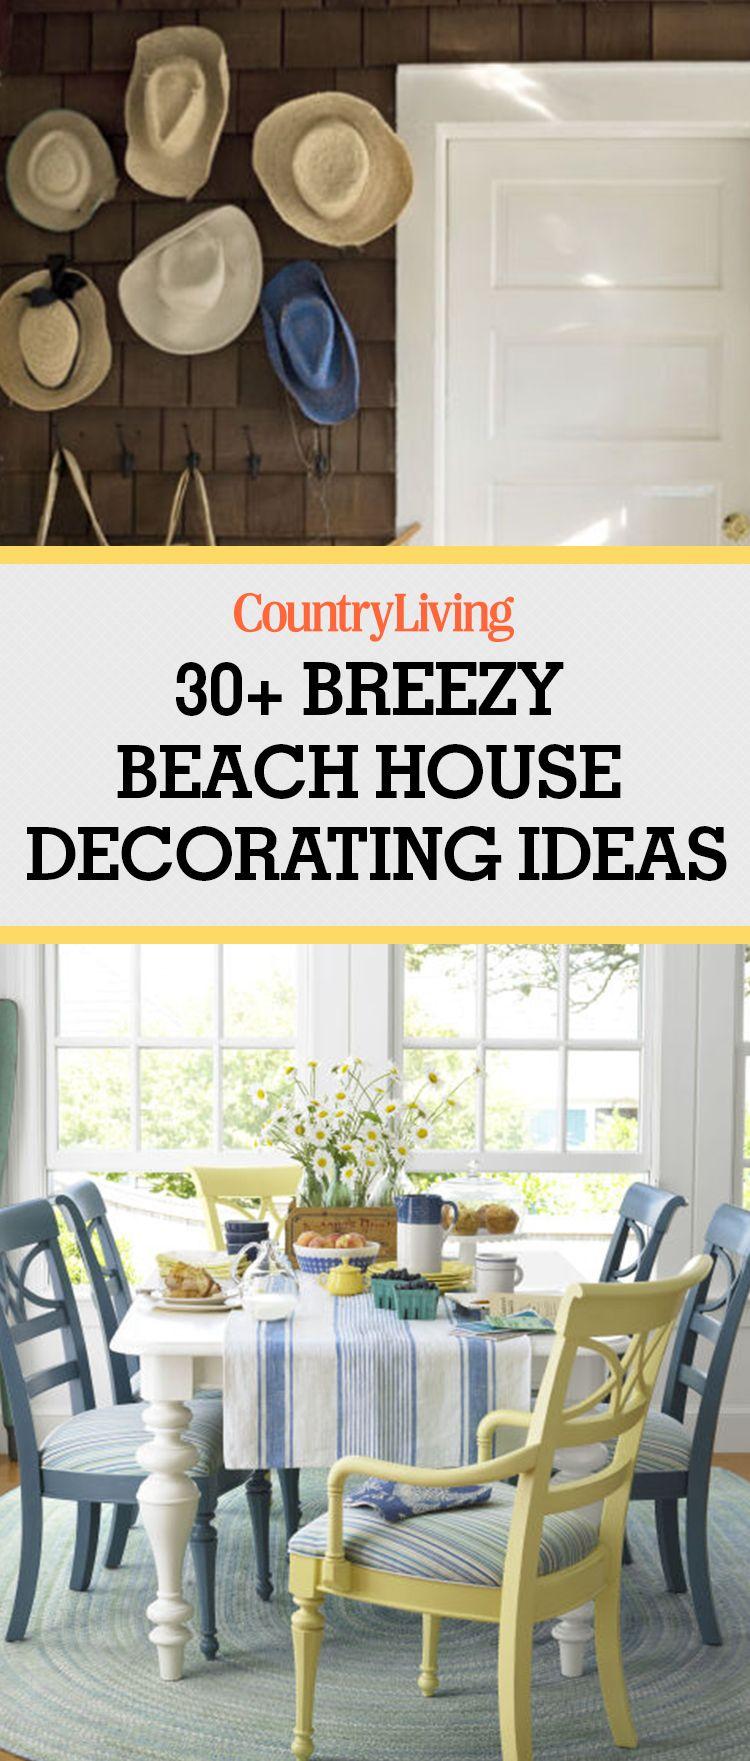 Fullsize Of Beach Decorating Ideas